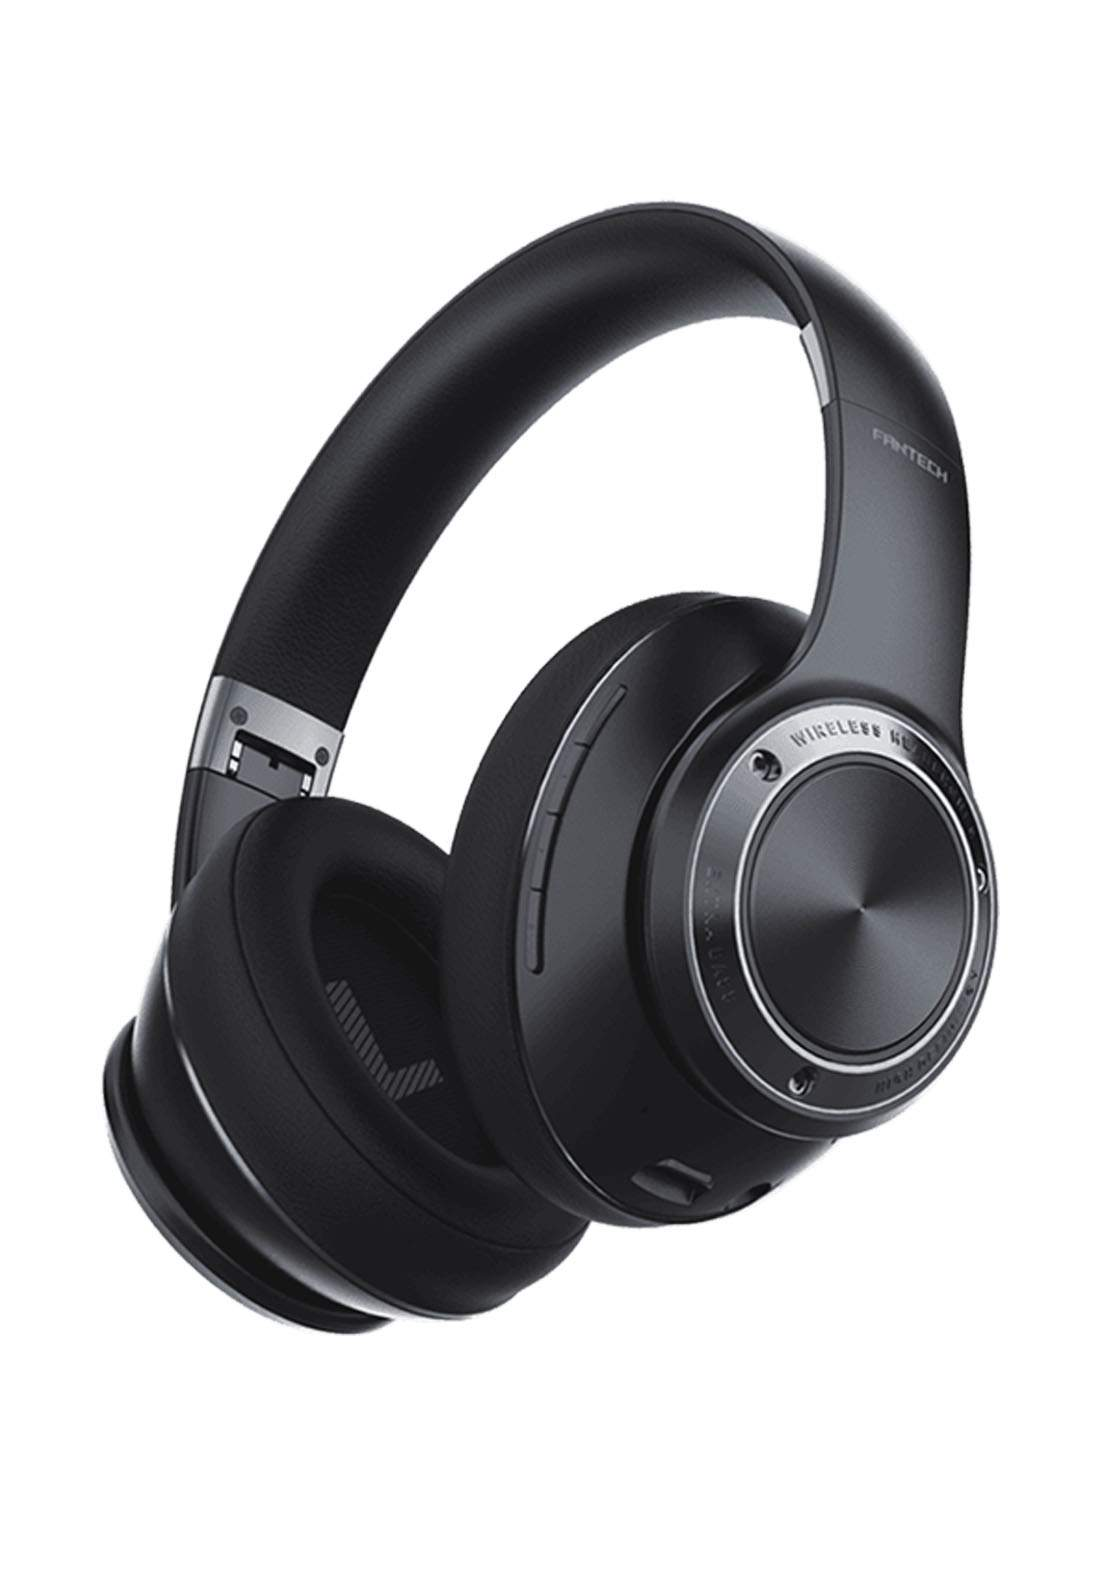 Fantech WH01 Wireless Headphones - Black سماعة